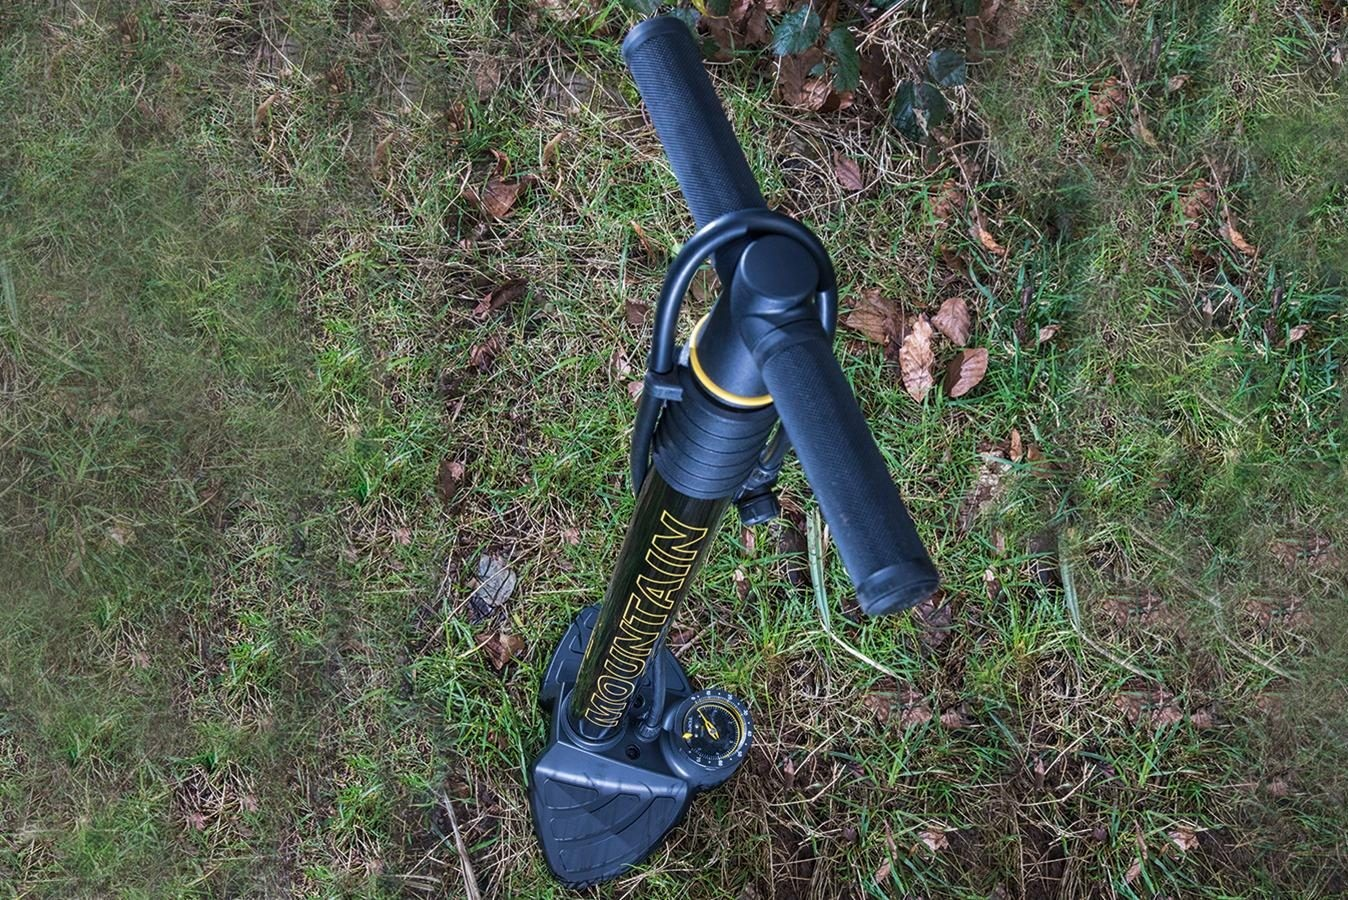 The Topeak Joe Blow Mountain track pump